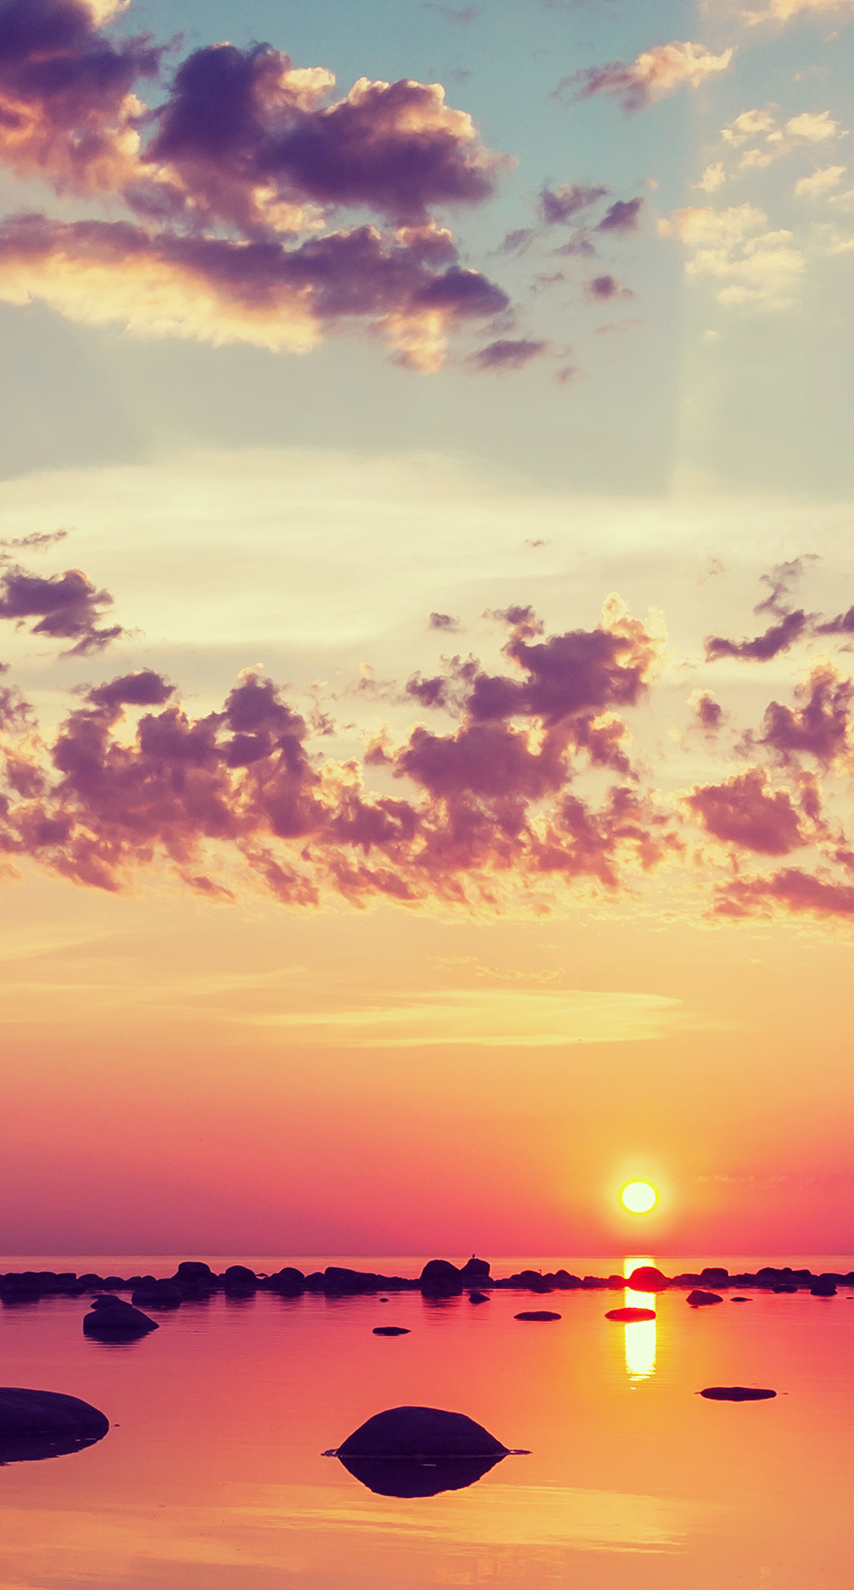 reflection, horizon